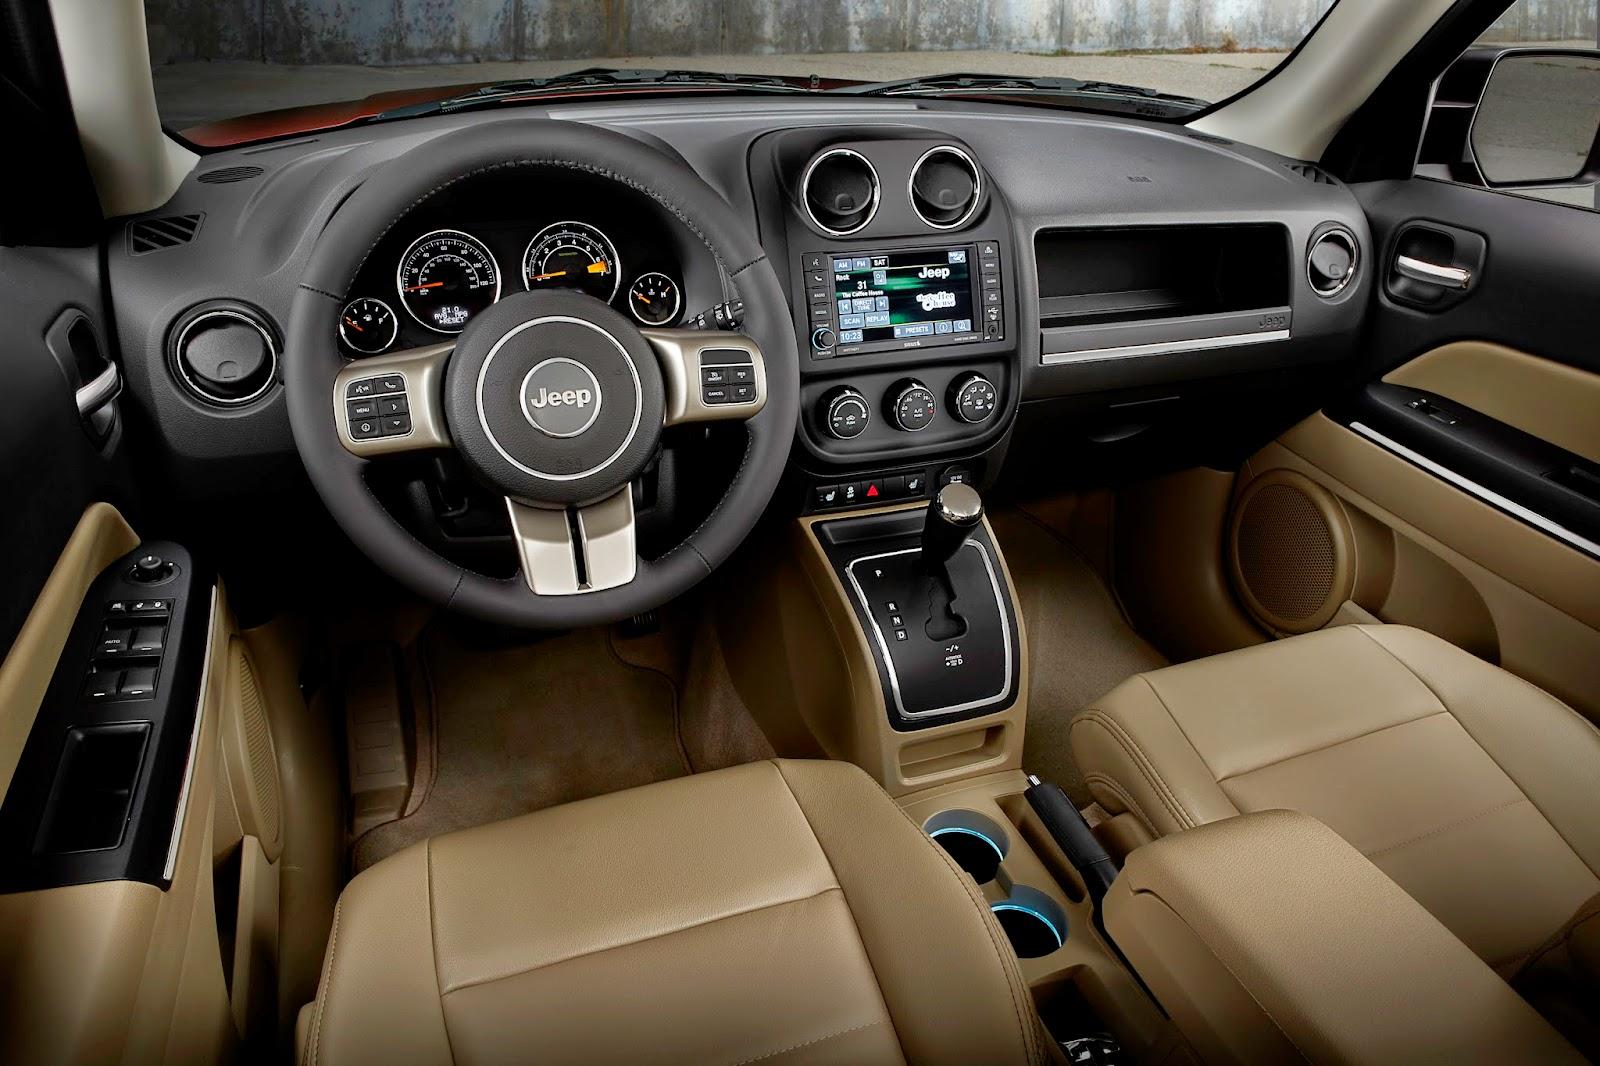 Interior view of 2014 Jeep Patriot Latitude